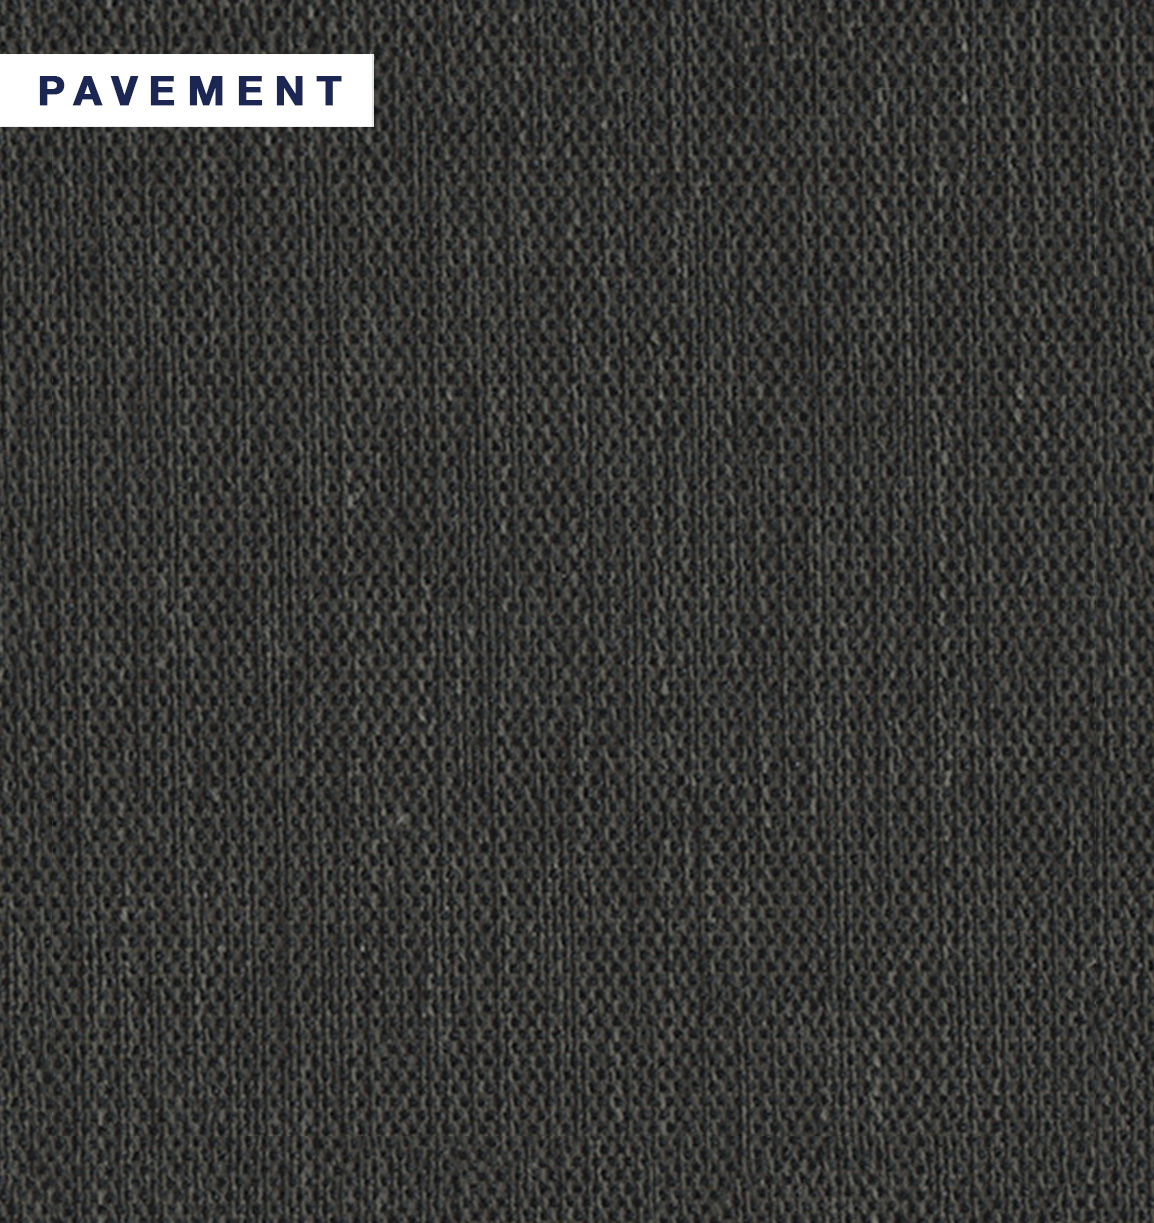 Jersey - Pavement.jpg